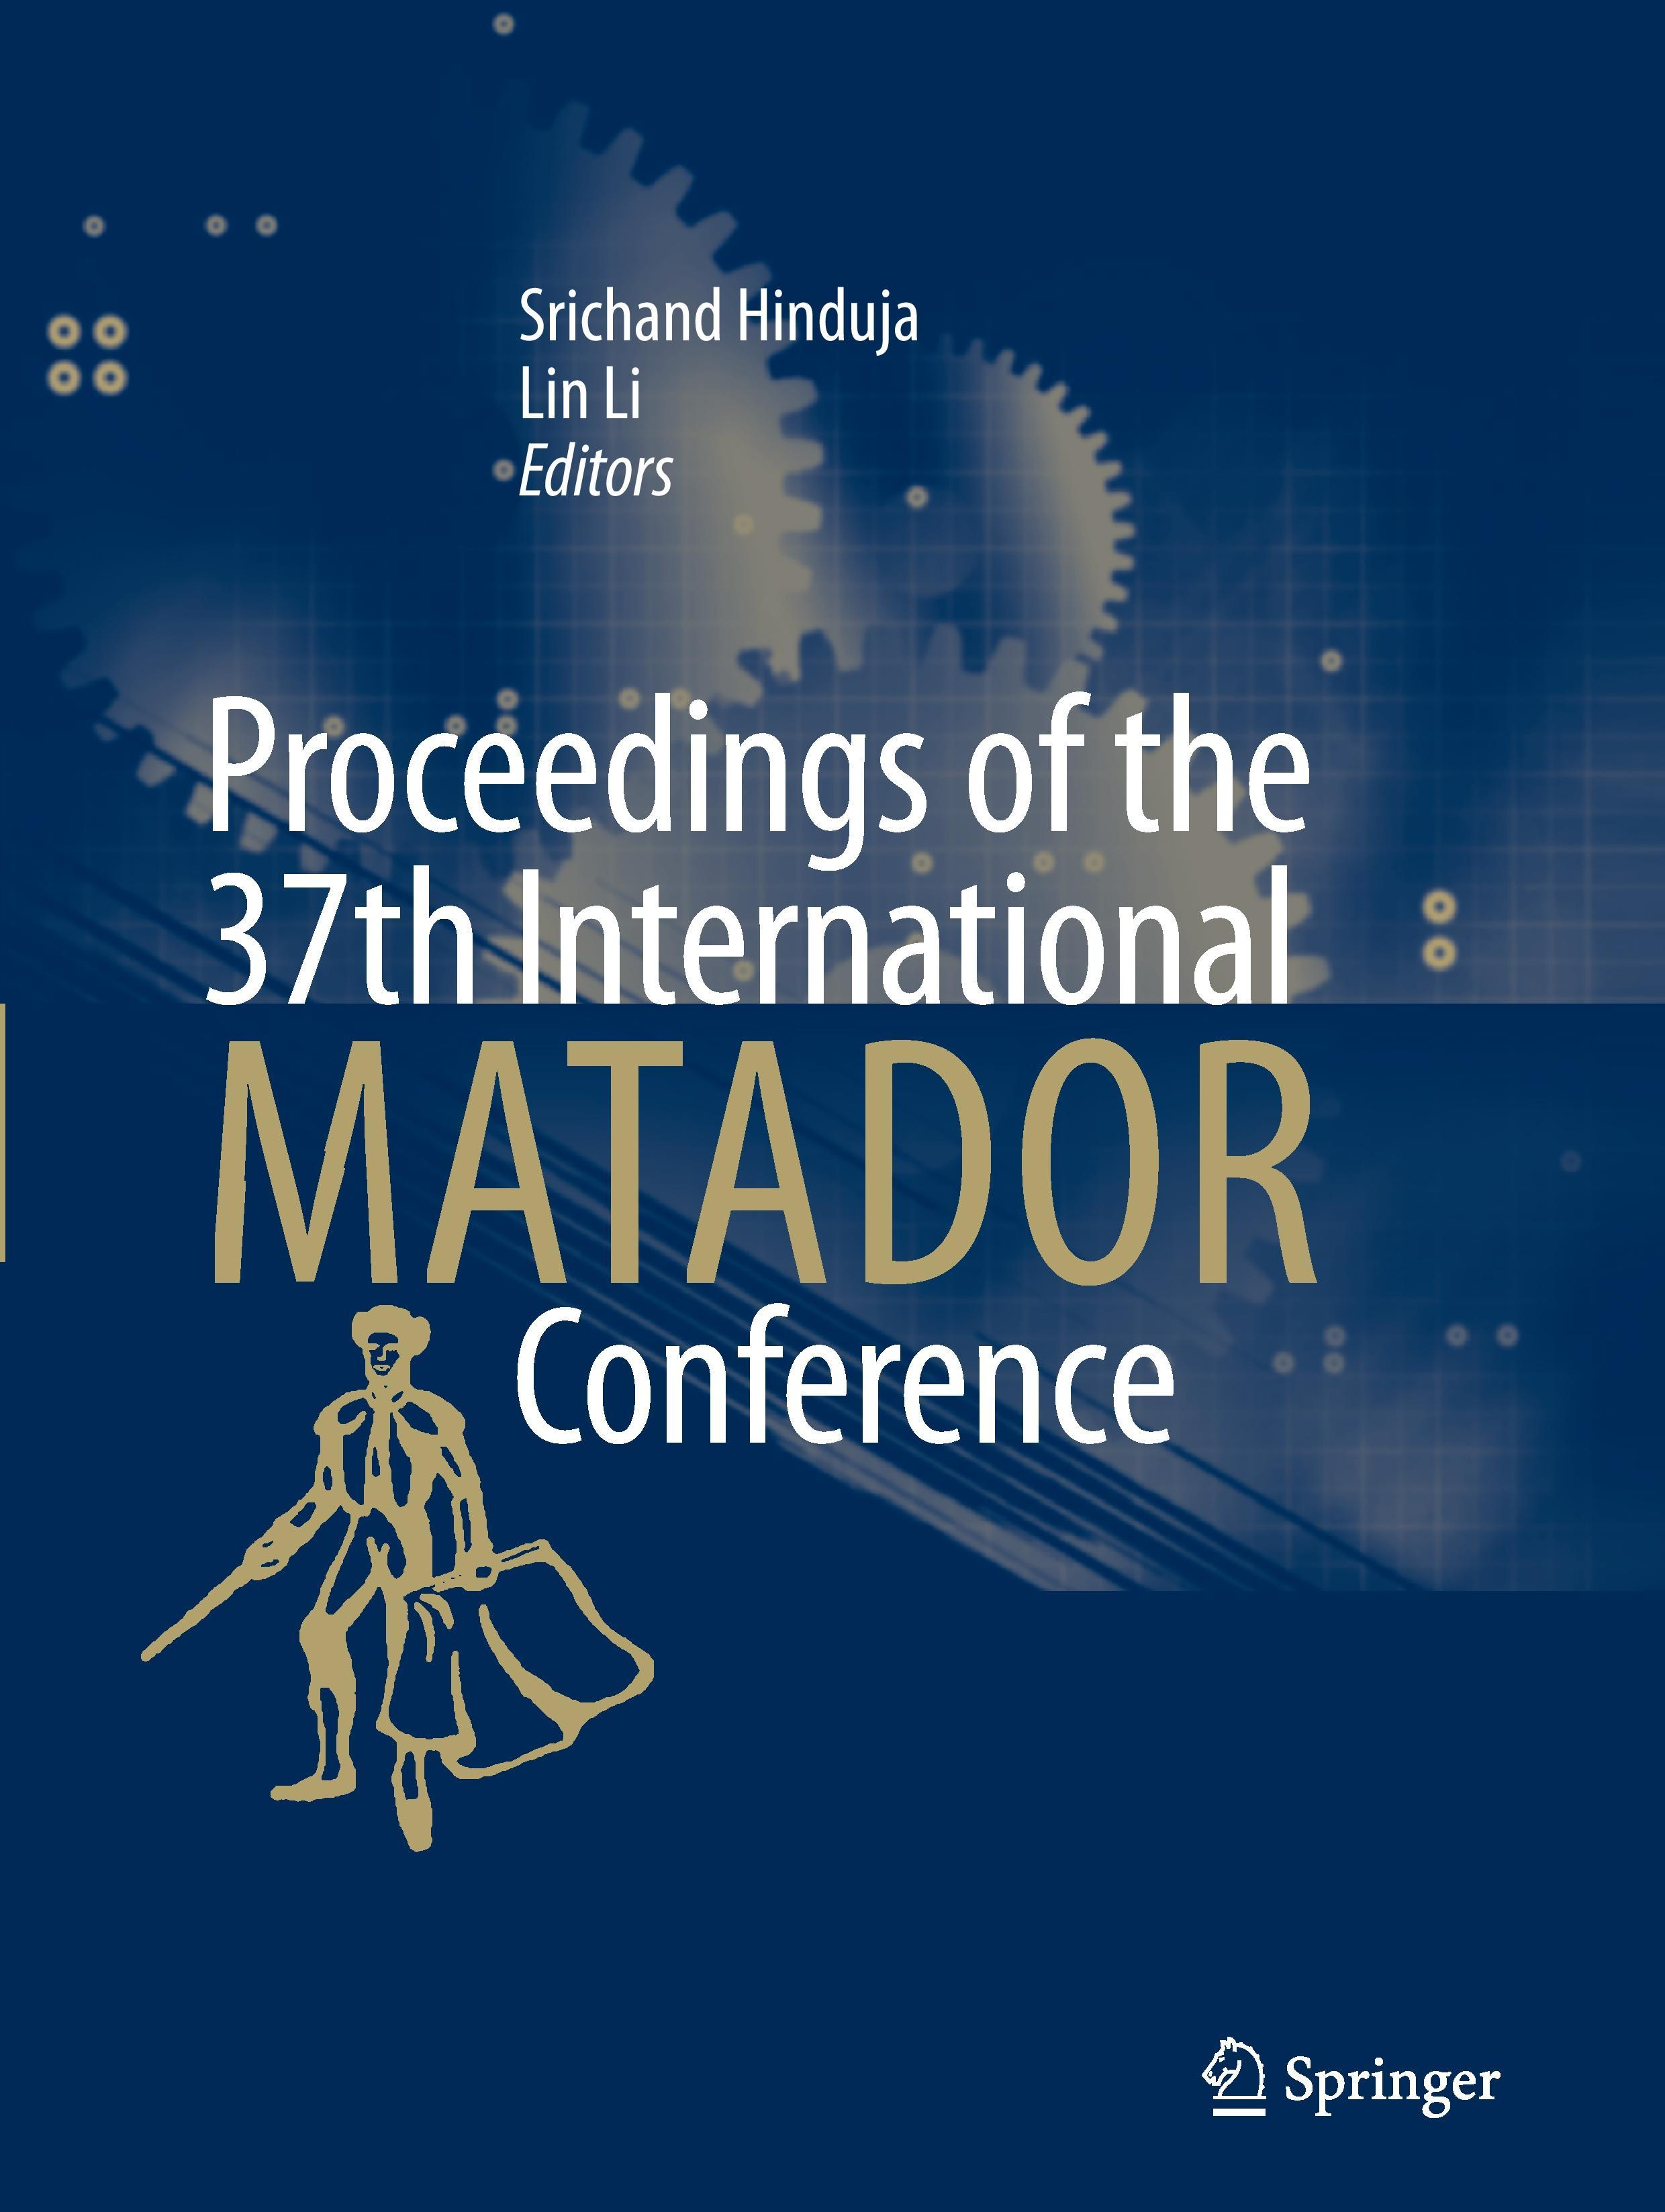 Proceedings of the 37th International MATADOR Conference - zum Schließen ins Bild klicken